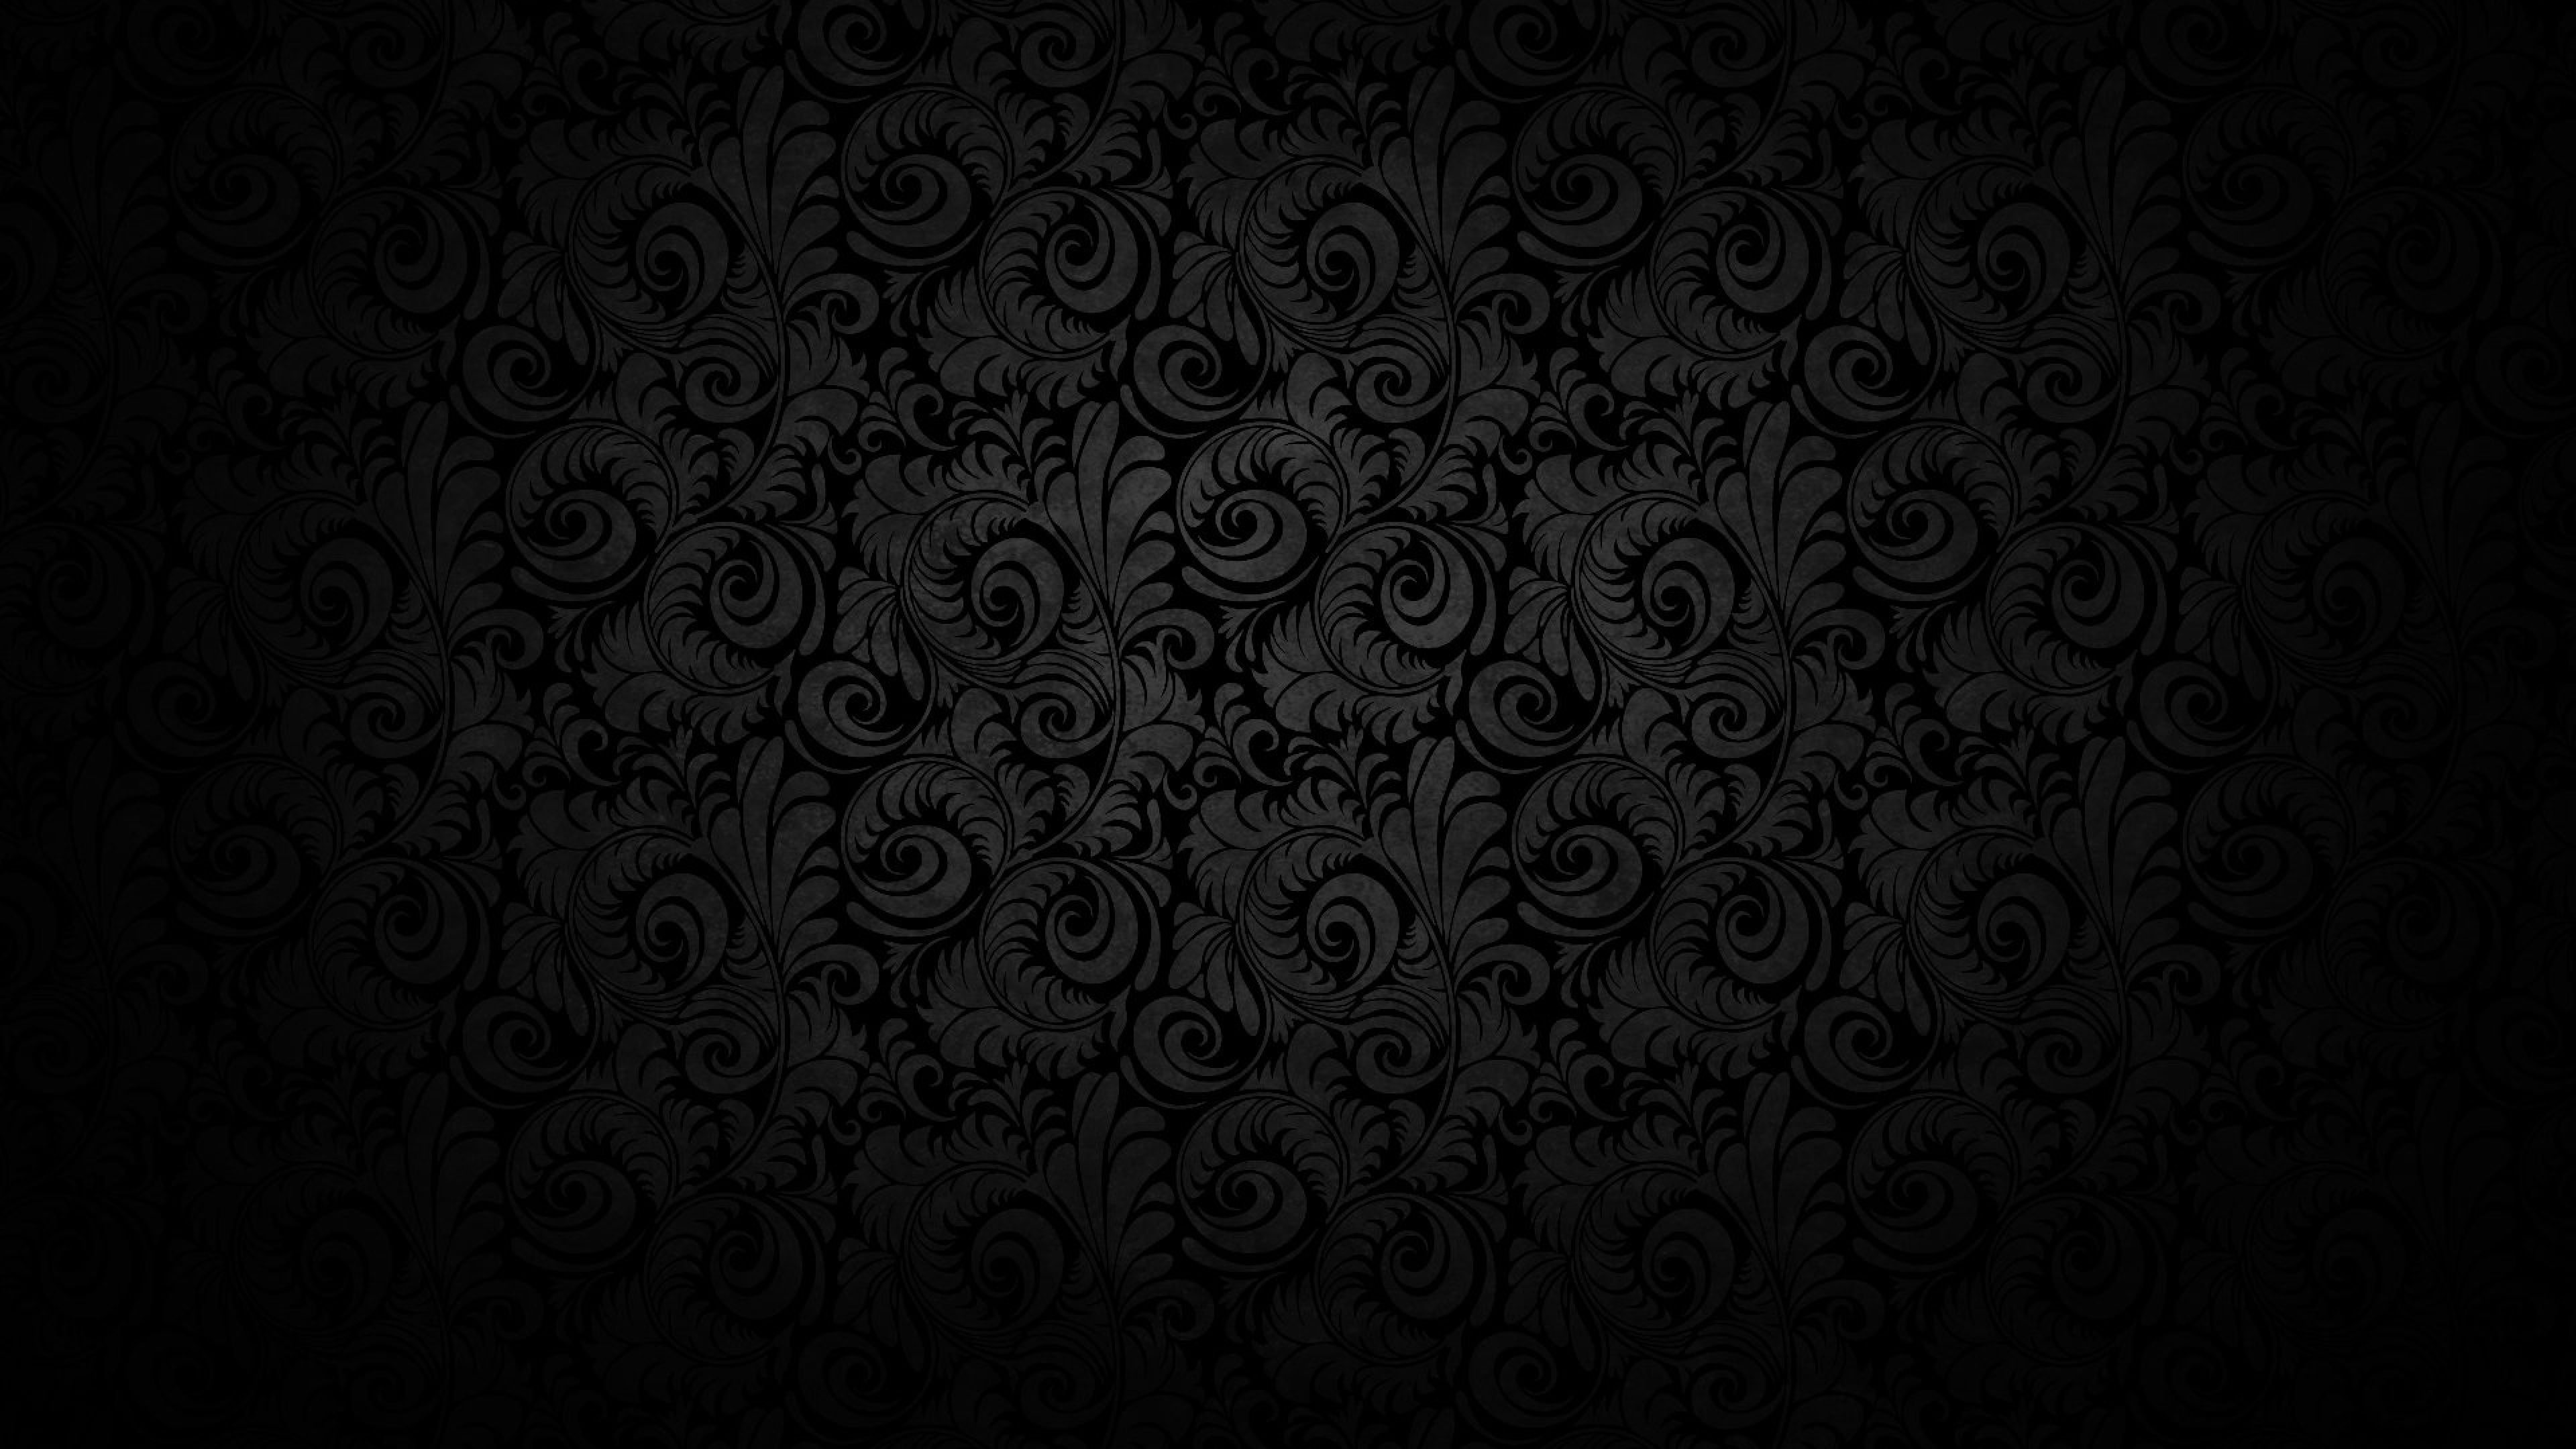 Black Background Is 4k Wallpaper Dark Black Wallpaper Black Background Wallpaper Black Hd Wallpaper